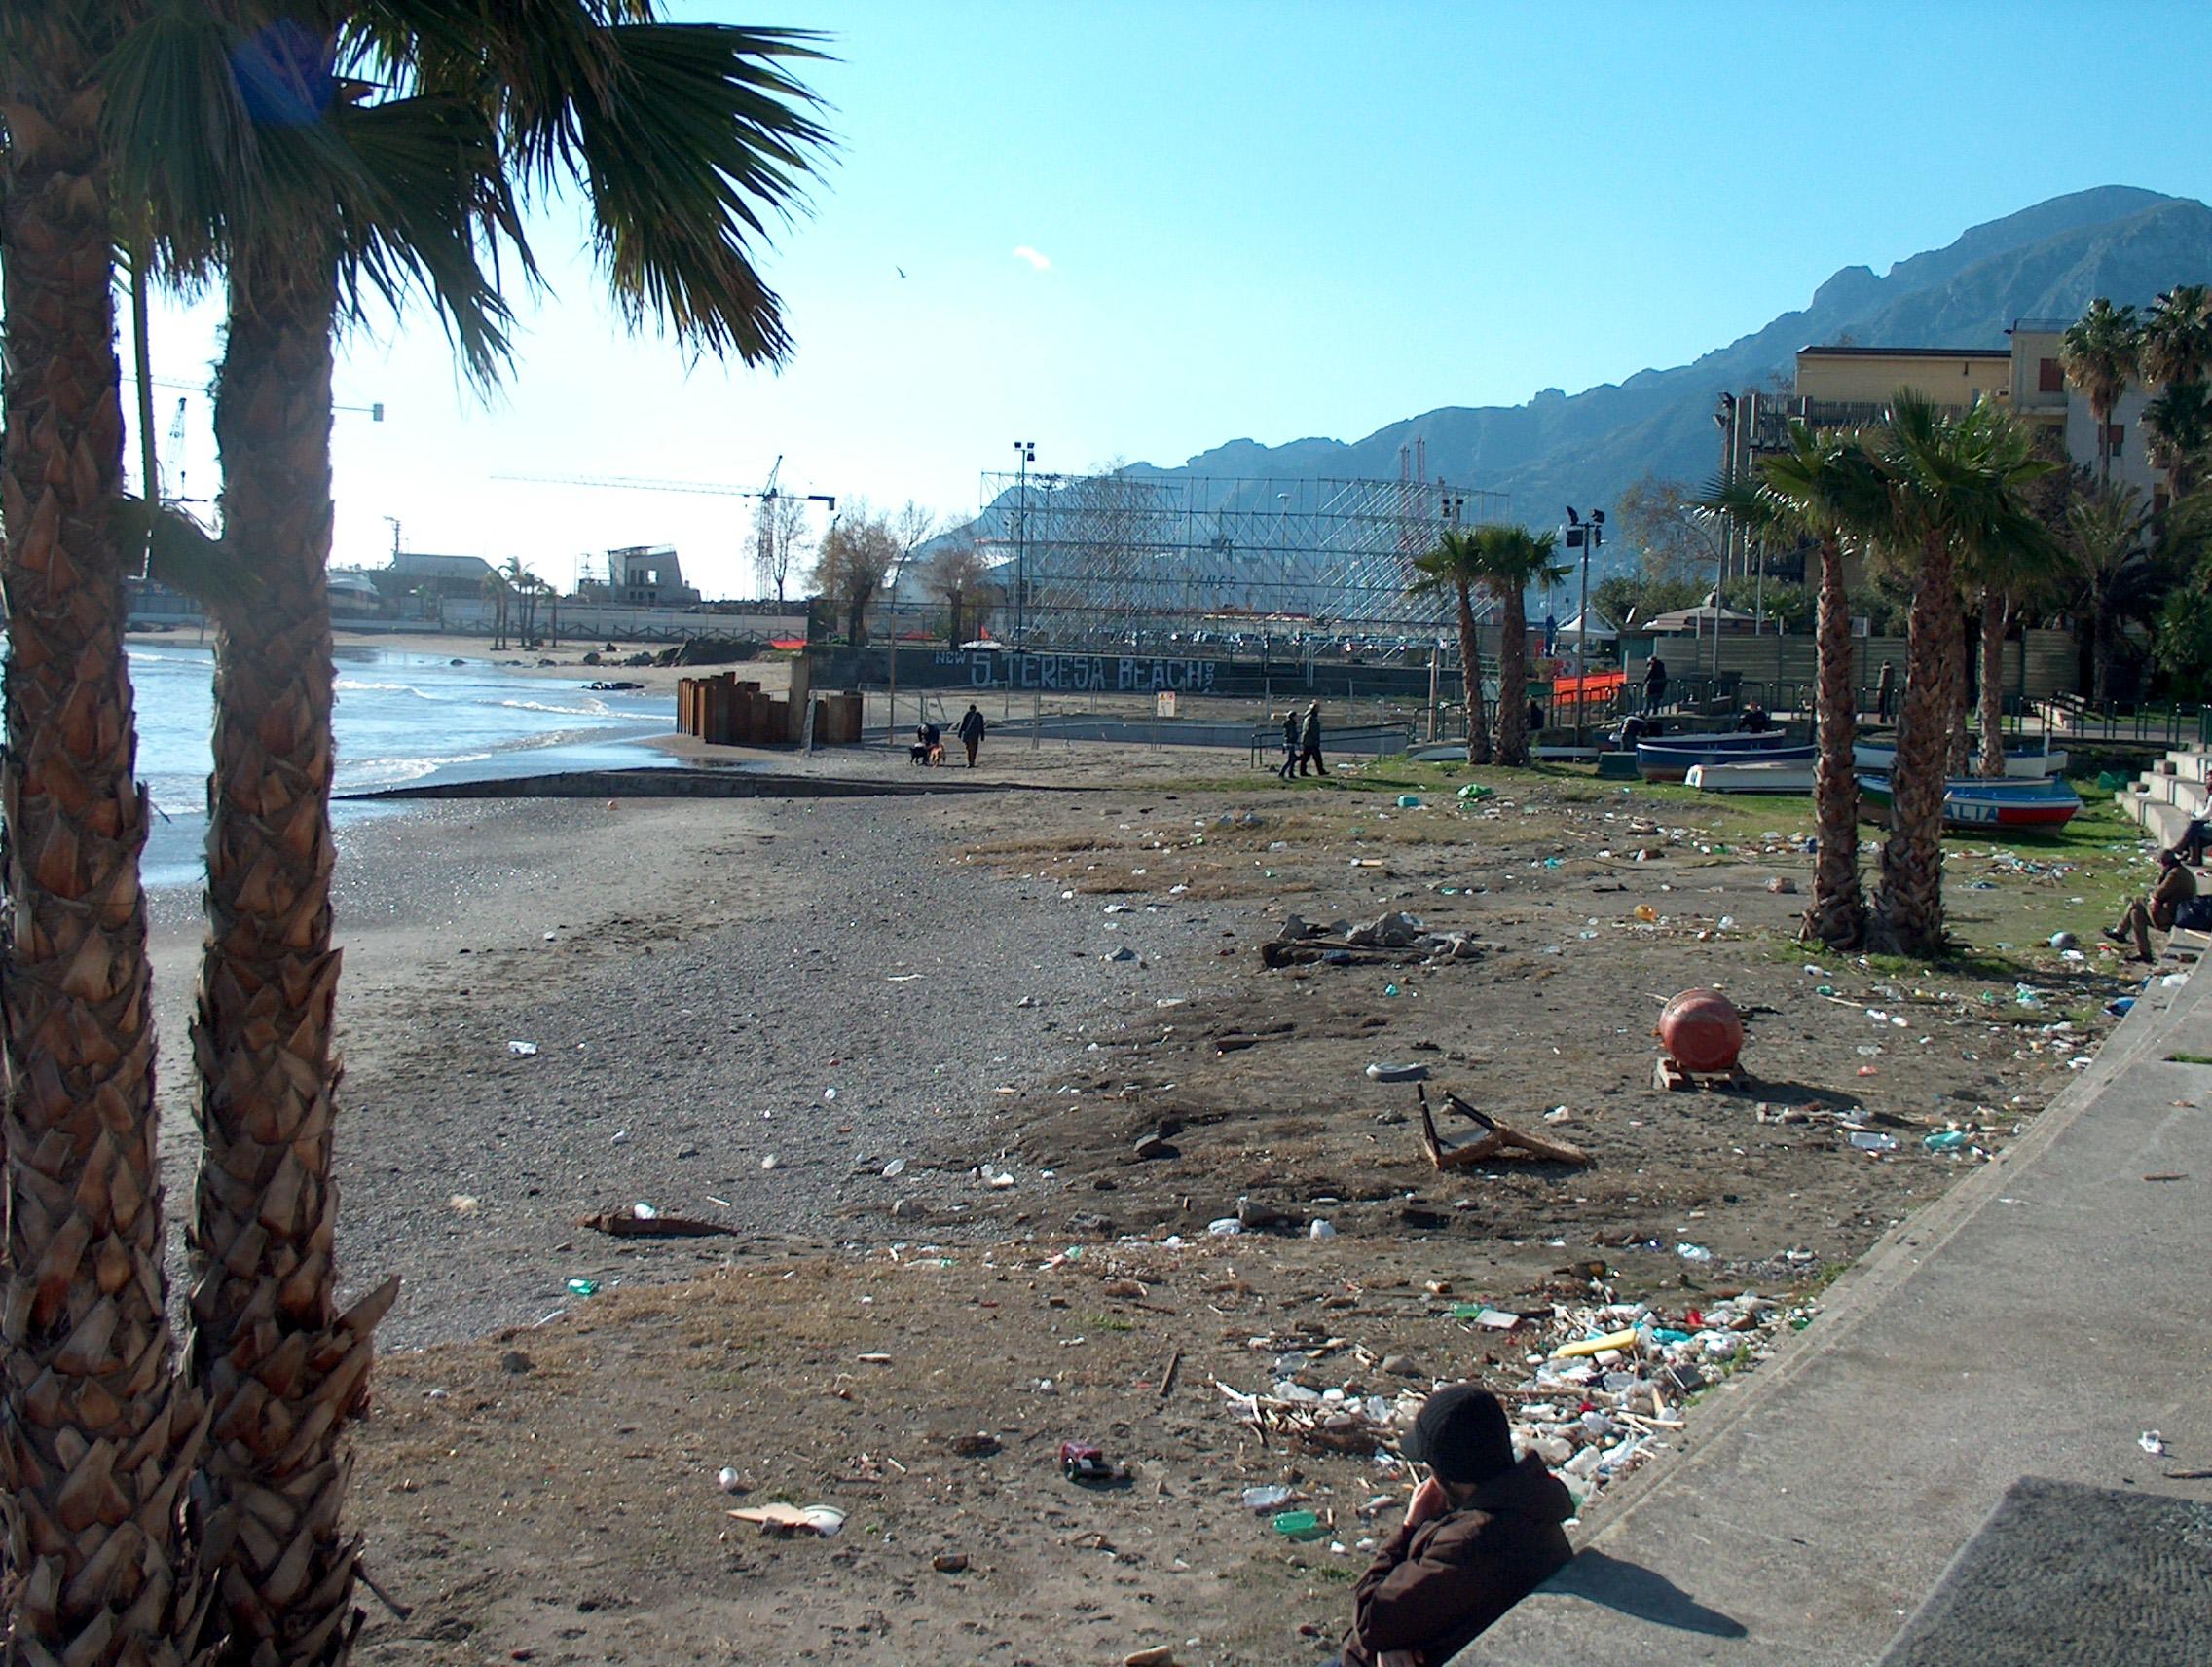 Matrimonio Spiaggia Salerno : Spiaggia salerno radiobussola radio bussola